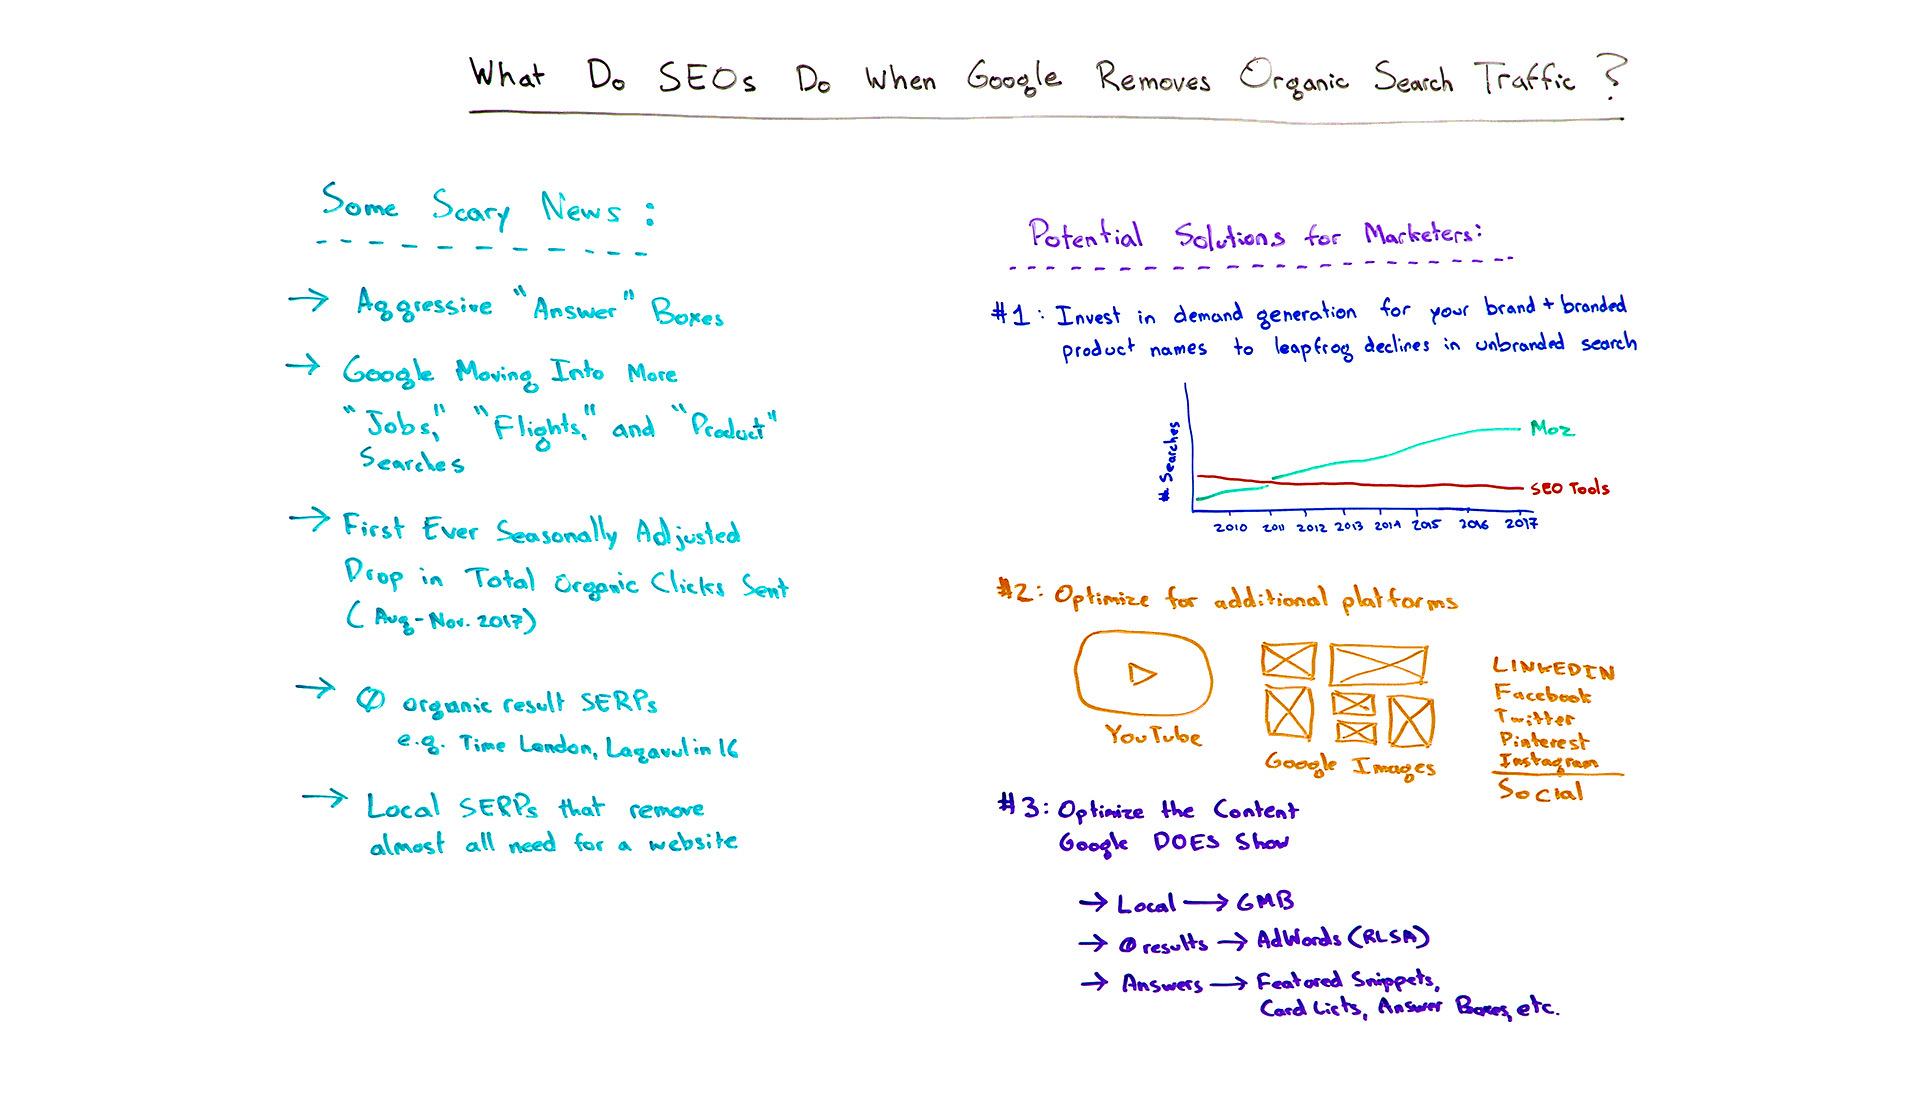 What Do SEOs Do When Google Removes Organic Search?